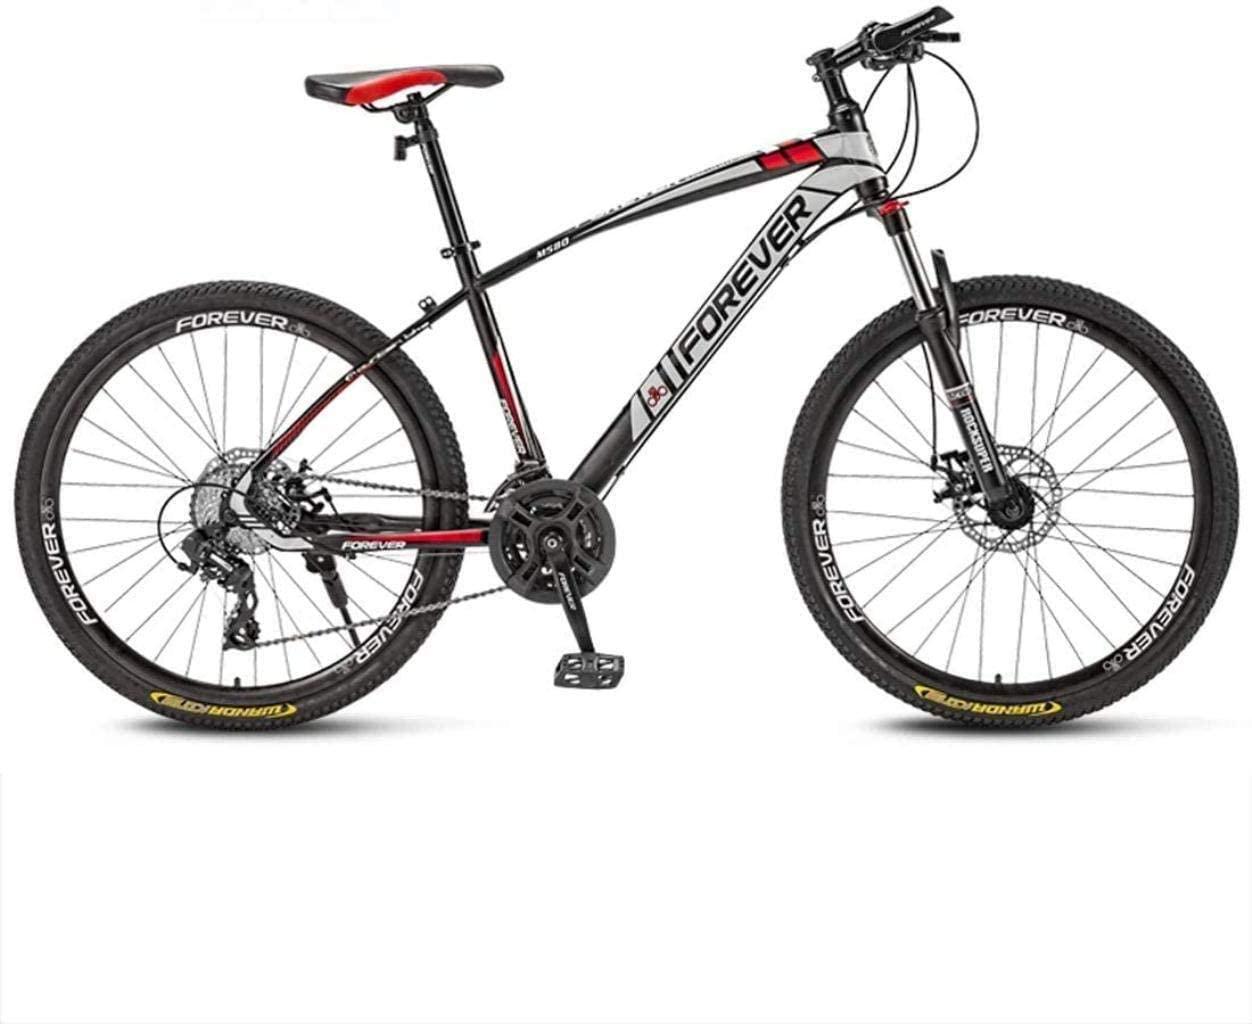 MJY 66 inch Mountain Bikes 21,24,27,30 Speed Mountain Bike 26 Inches Wheels Bicycle,White, Red, Blue,Black 6-11,A,30